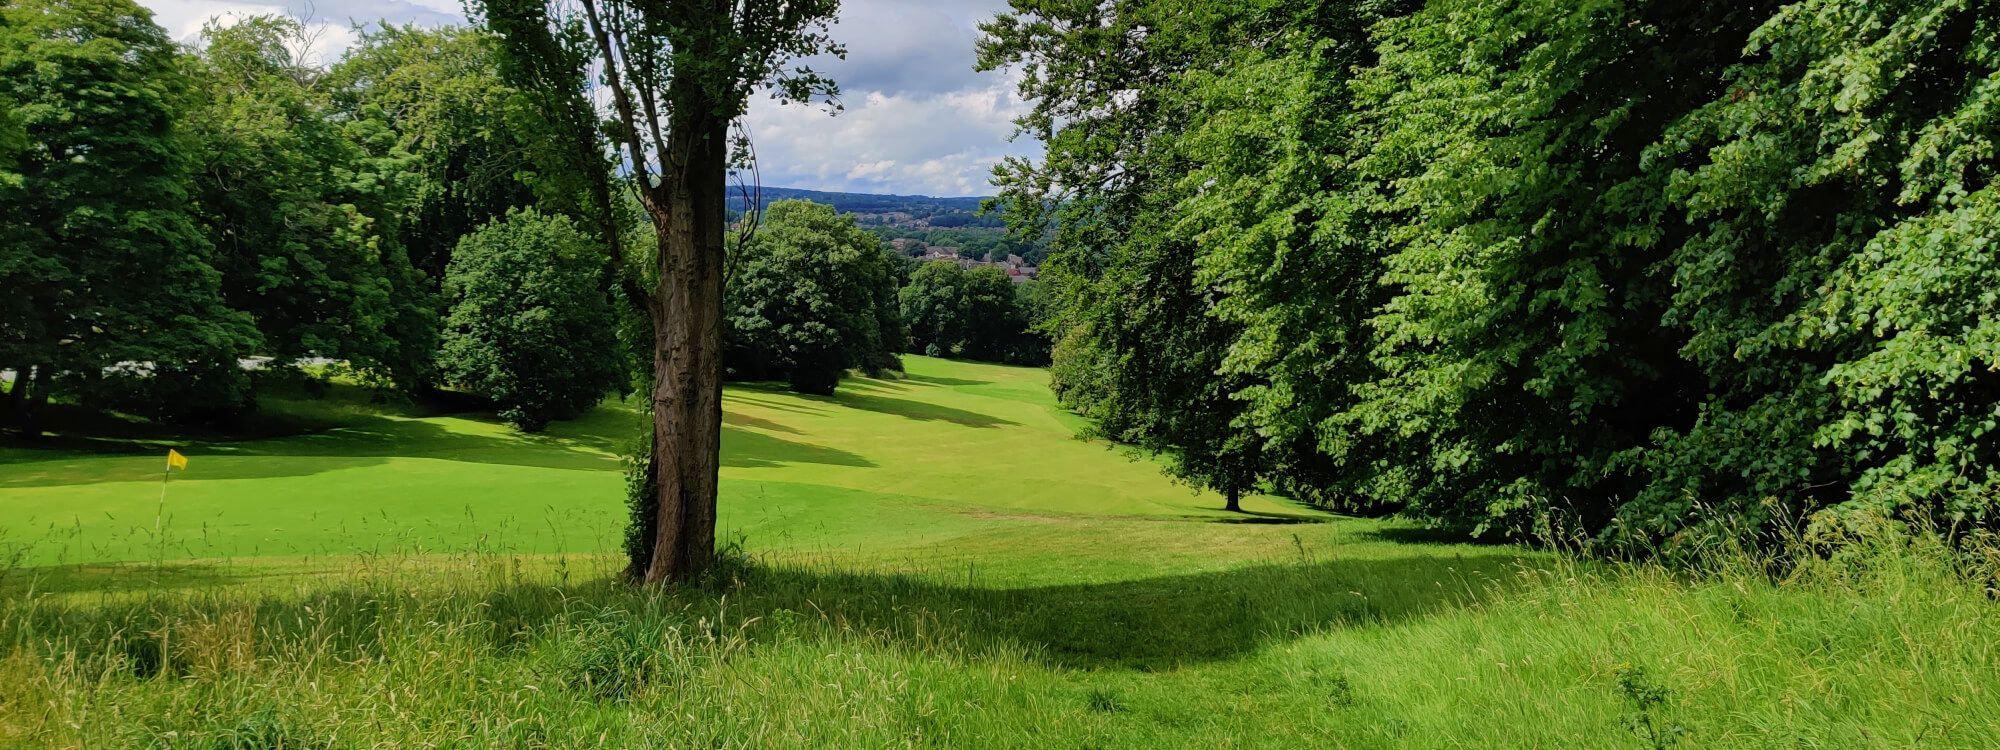 Armley Park view